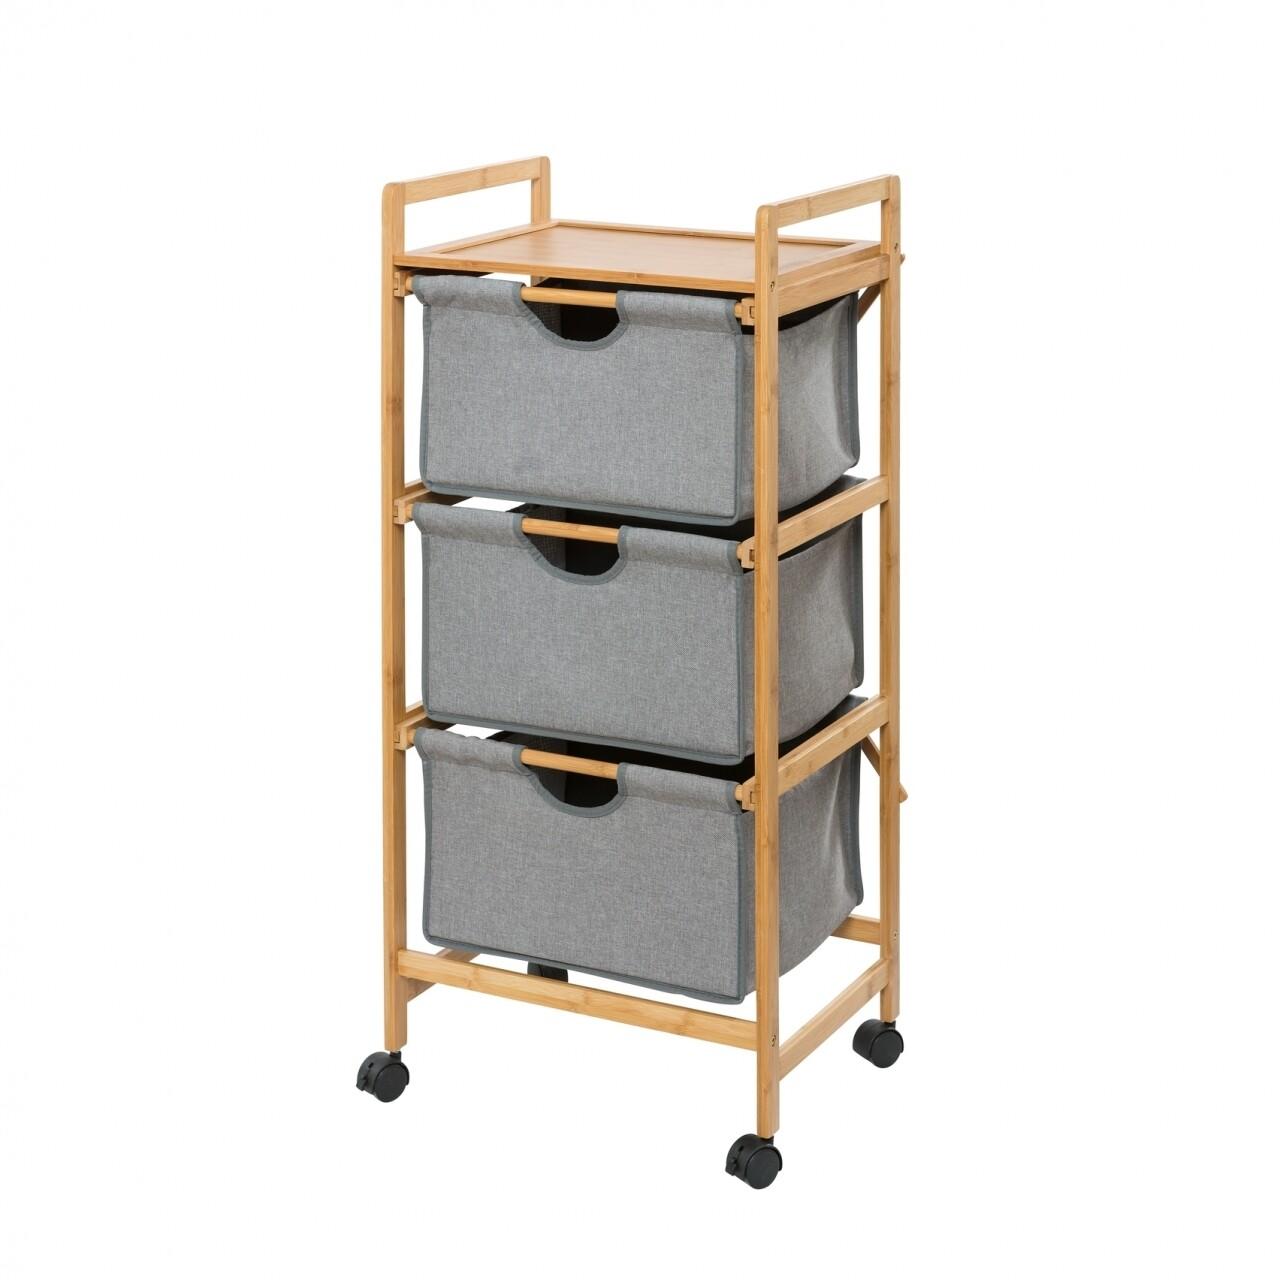 Suport etajat cu 3 sertare mobil Bahari, Wenko, 44 x 96 cm, bambus/poliester/bumbac, natur/gri